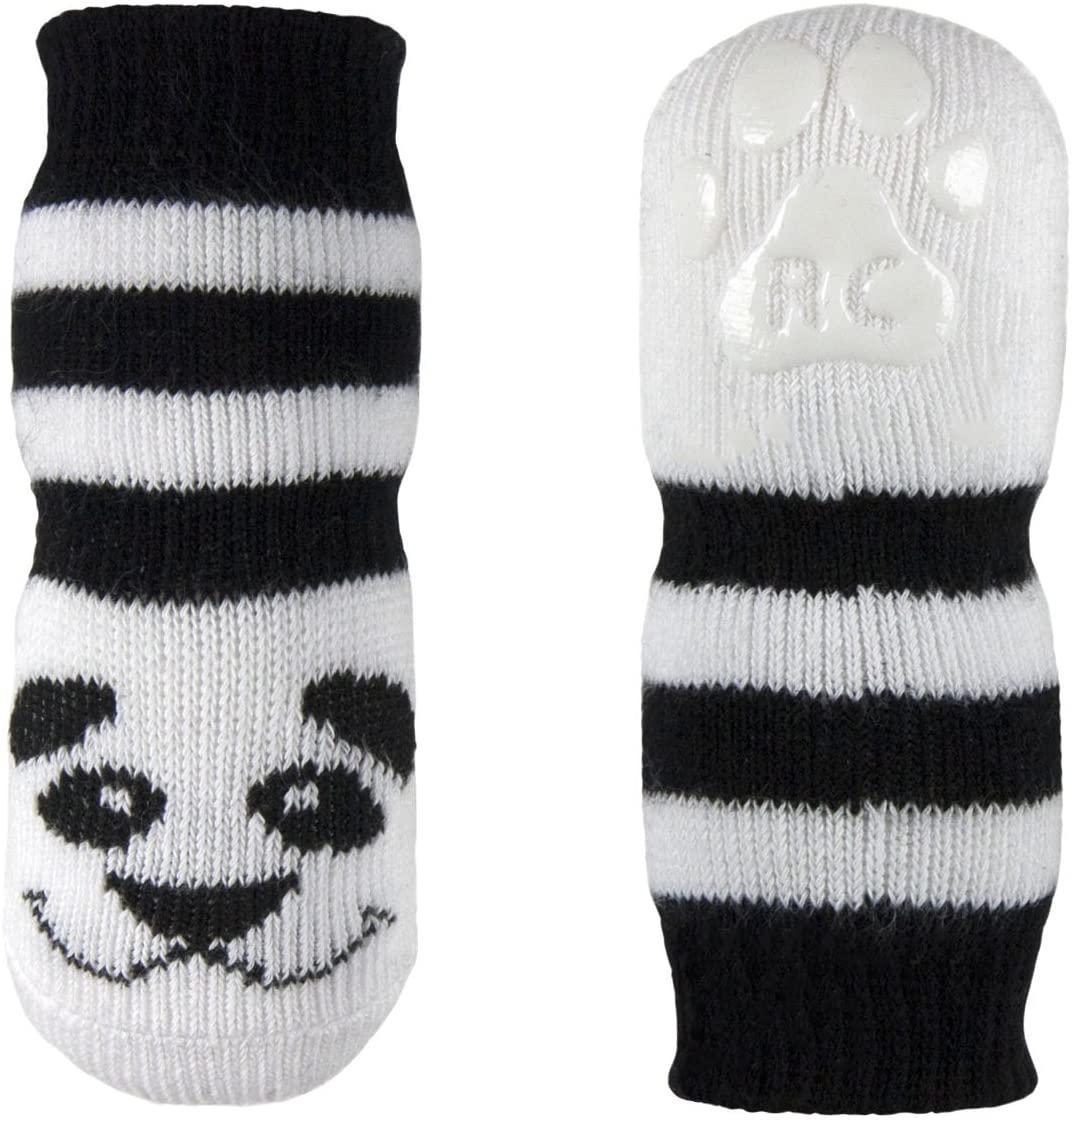 RC Pet Products Pawks Dog Socks, Panda, Small